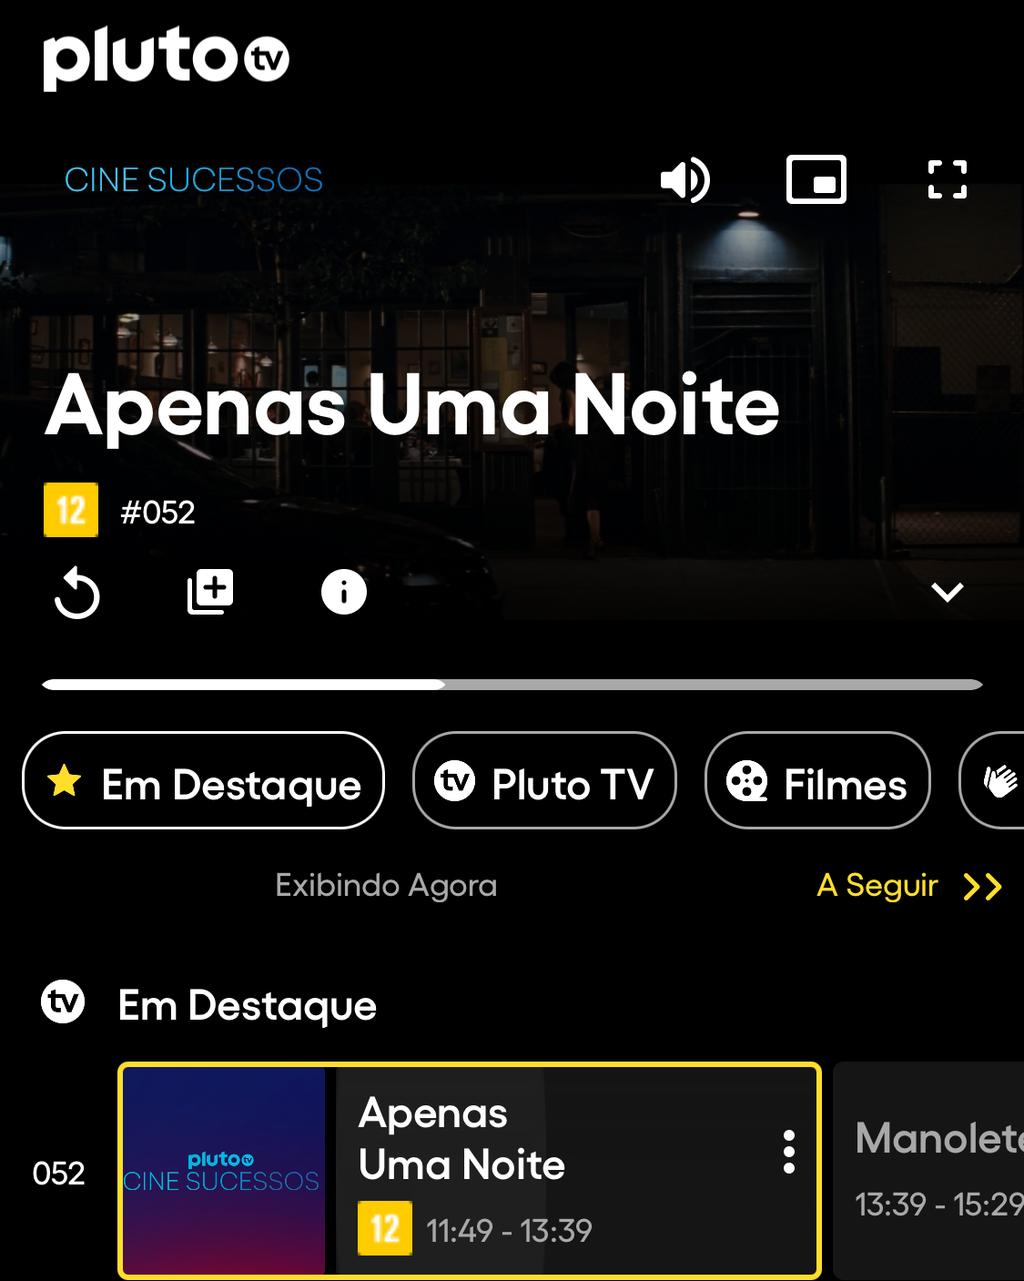 Pluto Tv Como Assistir Canais Ao Vivo Series E Filmes Gratis Canaltech